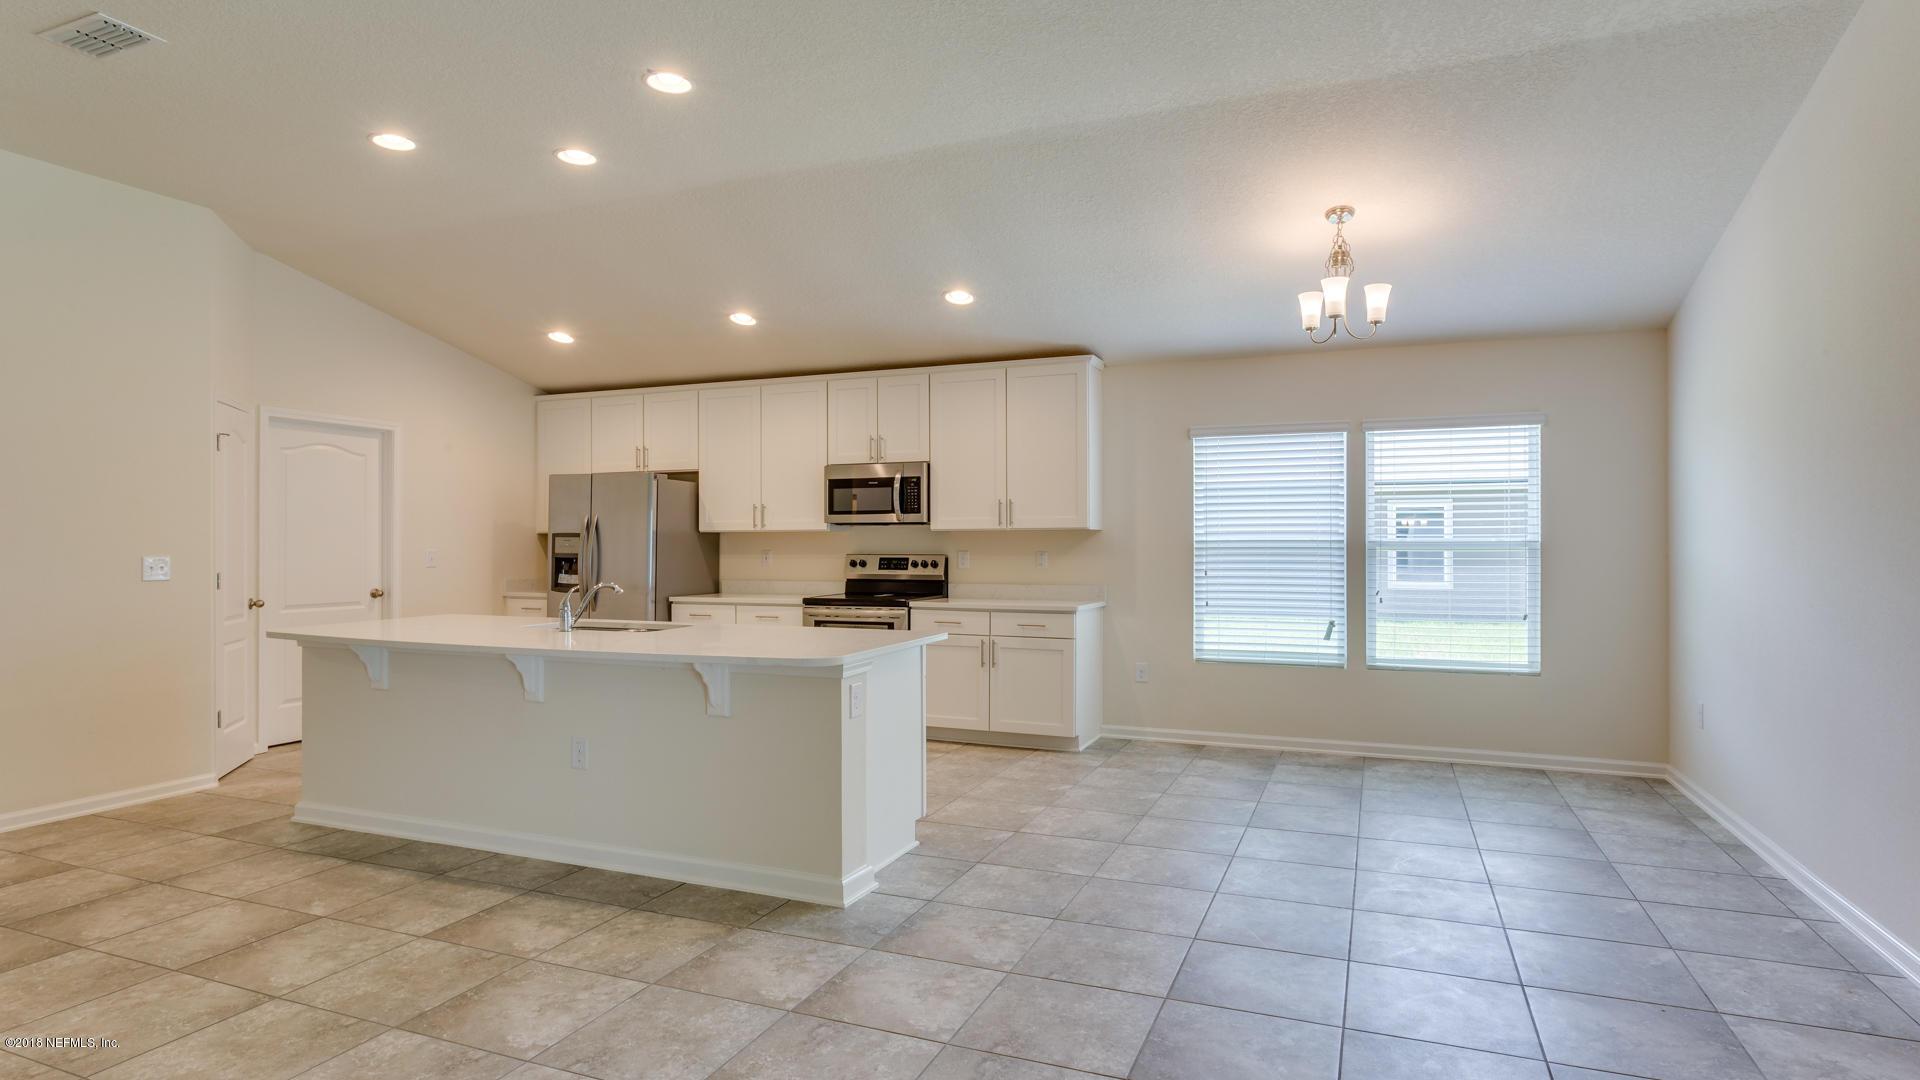 7076 SANDLE, JACKSONVILLE, FLORIDA 32219, 4 Bedrooms Bedrooms, ,3 BathroomsBathrooms,Residential - single family,For sale,SANDLE,912064